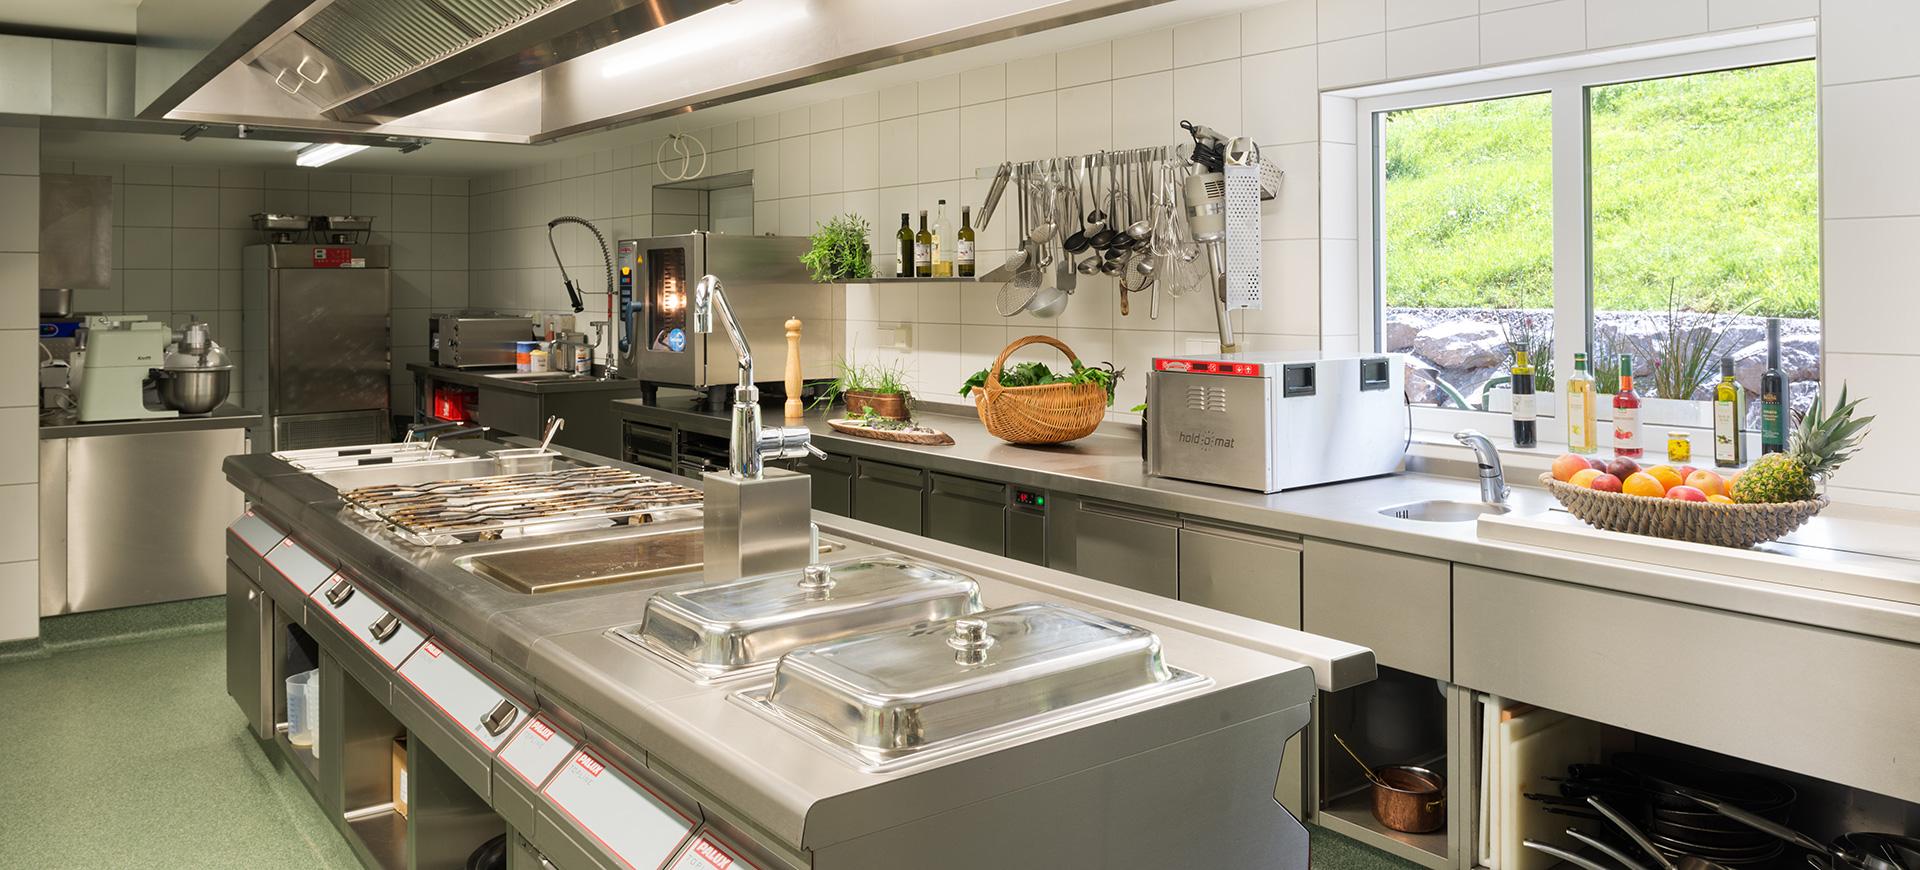 Mattlihüs Küche